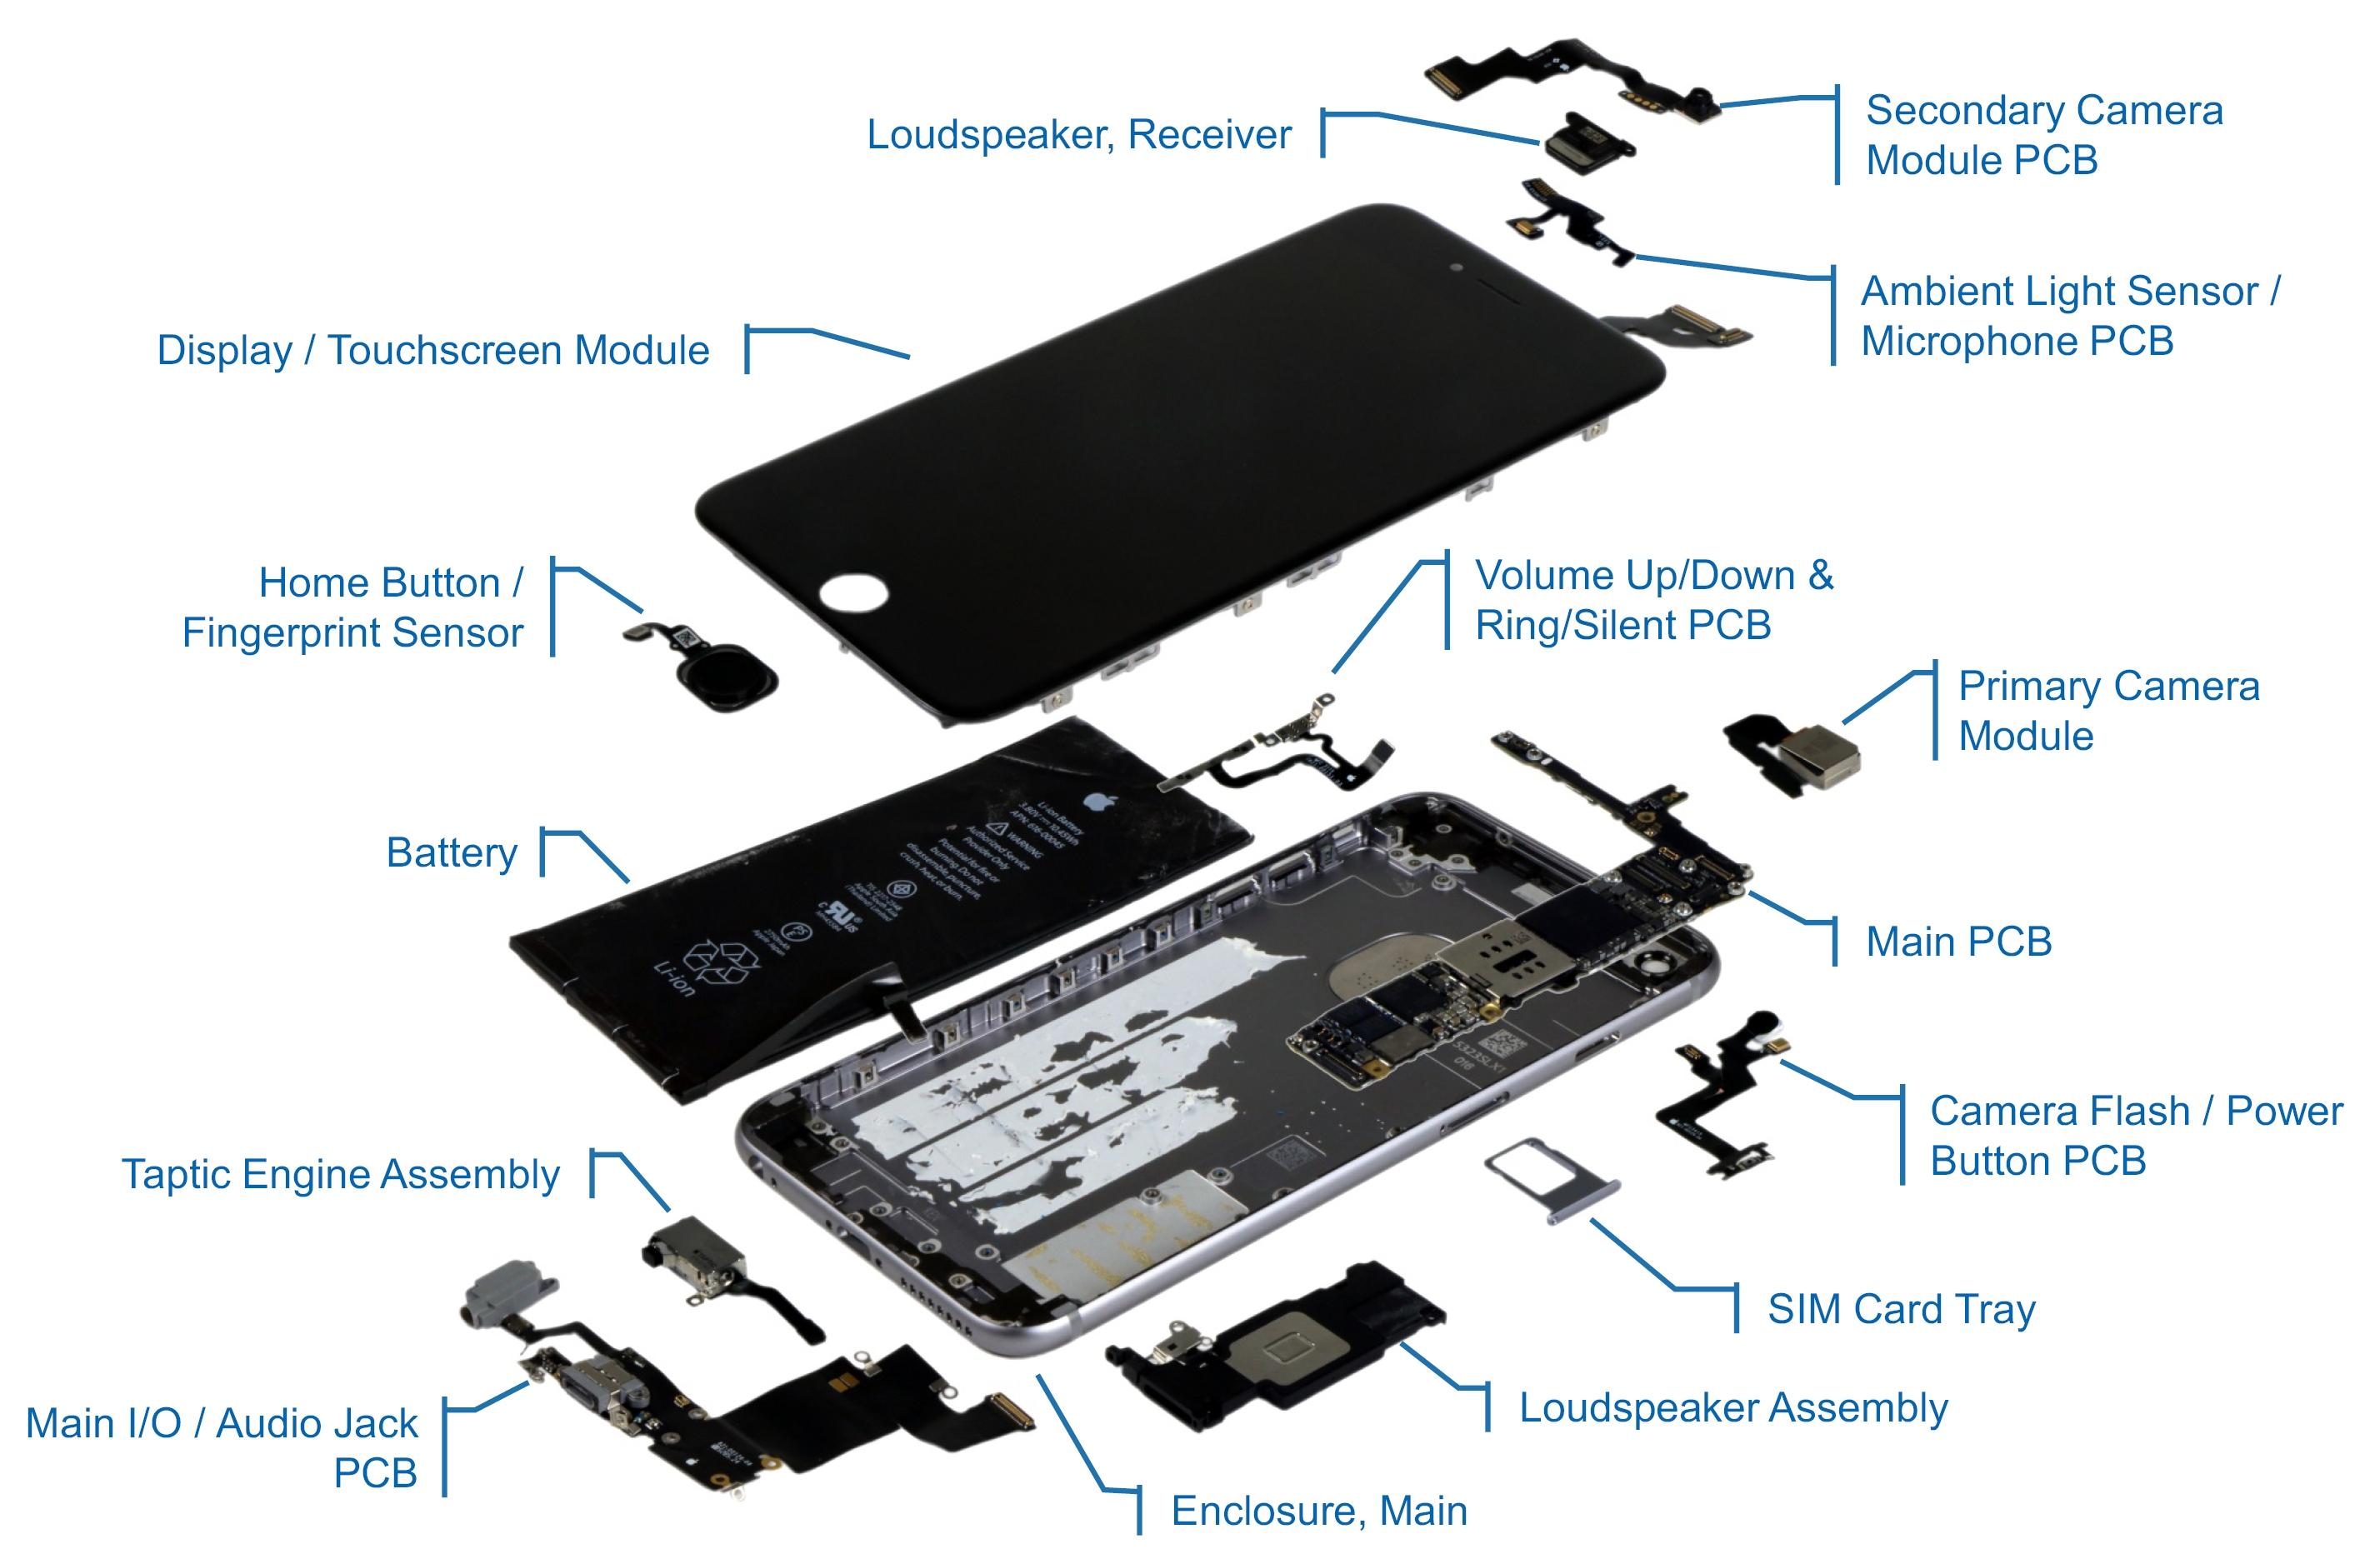 IPhone 6s 32 GB (kulta) - Matkapuhelimet - Gigantti Apple iPhone puhelimet hintaan 301,94